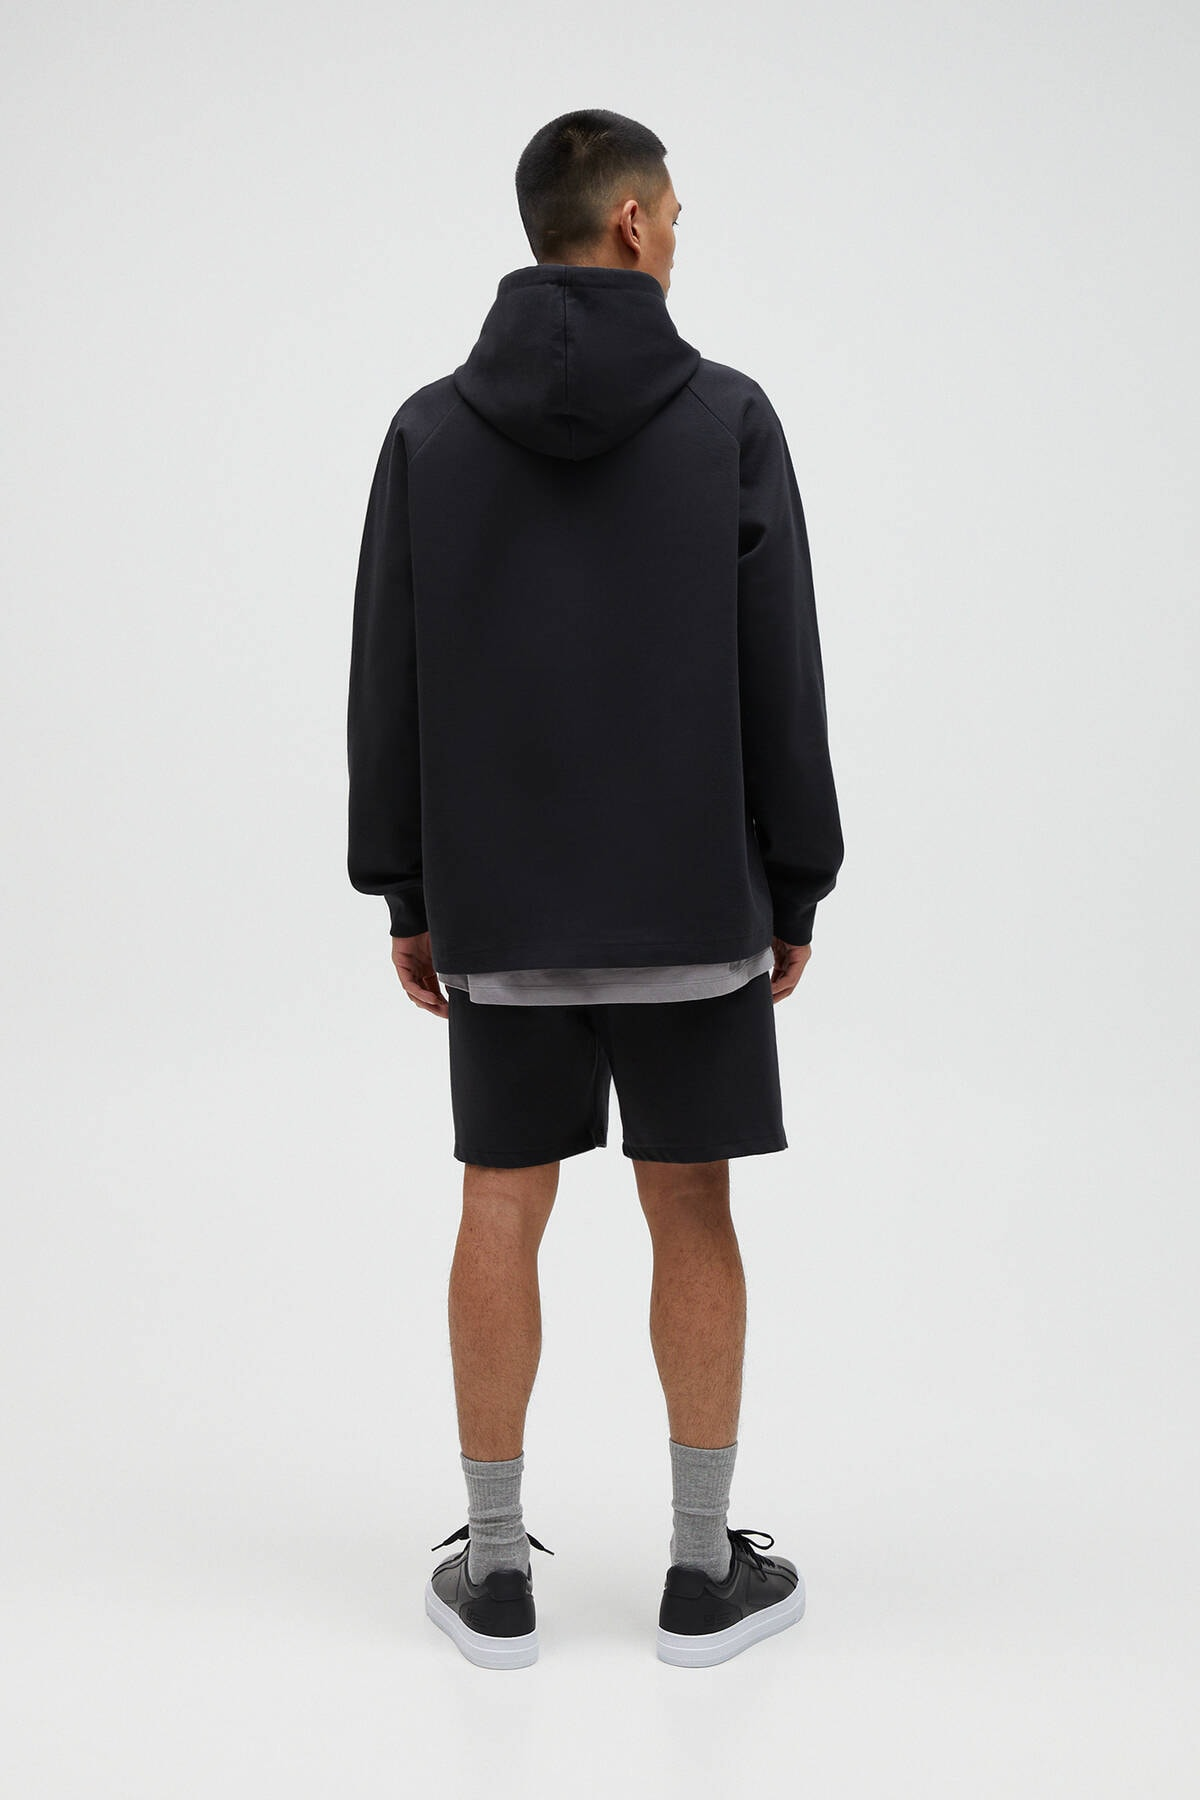 Pull & Bear Erkek Siyah Basic Comfort Fit Kapüşonlu Sweatshirt - En Az %75 Organik Pamuklu 04592900 3